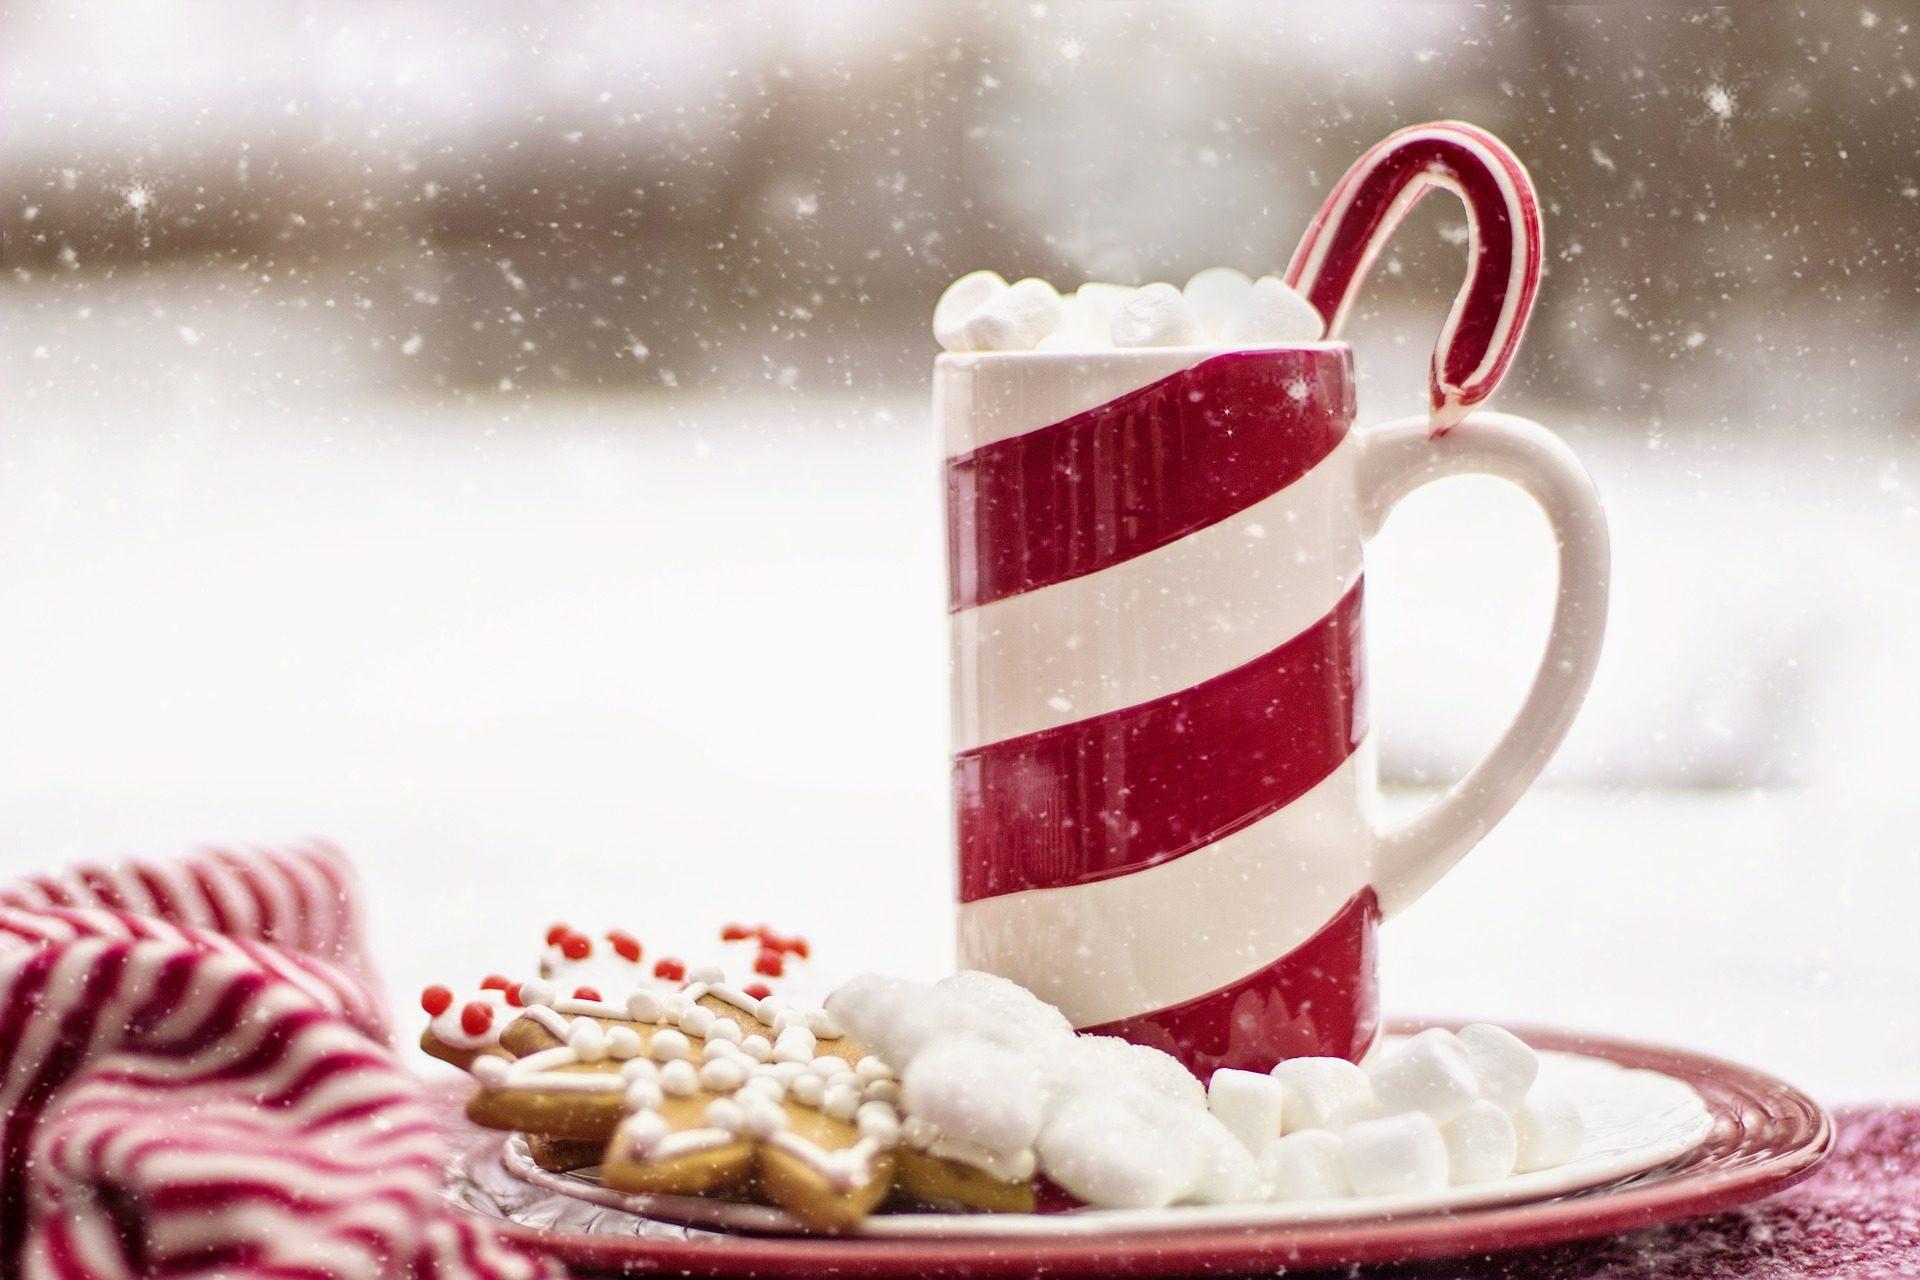 Coppa, canna, cookie, neve, Natale - Sfondi HD - Professor-falken.com